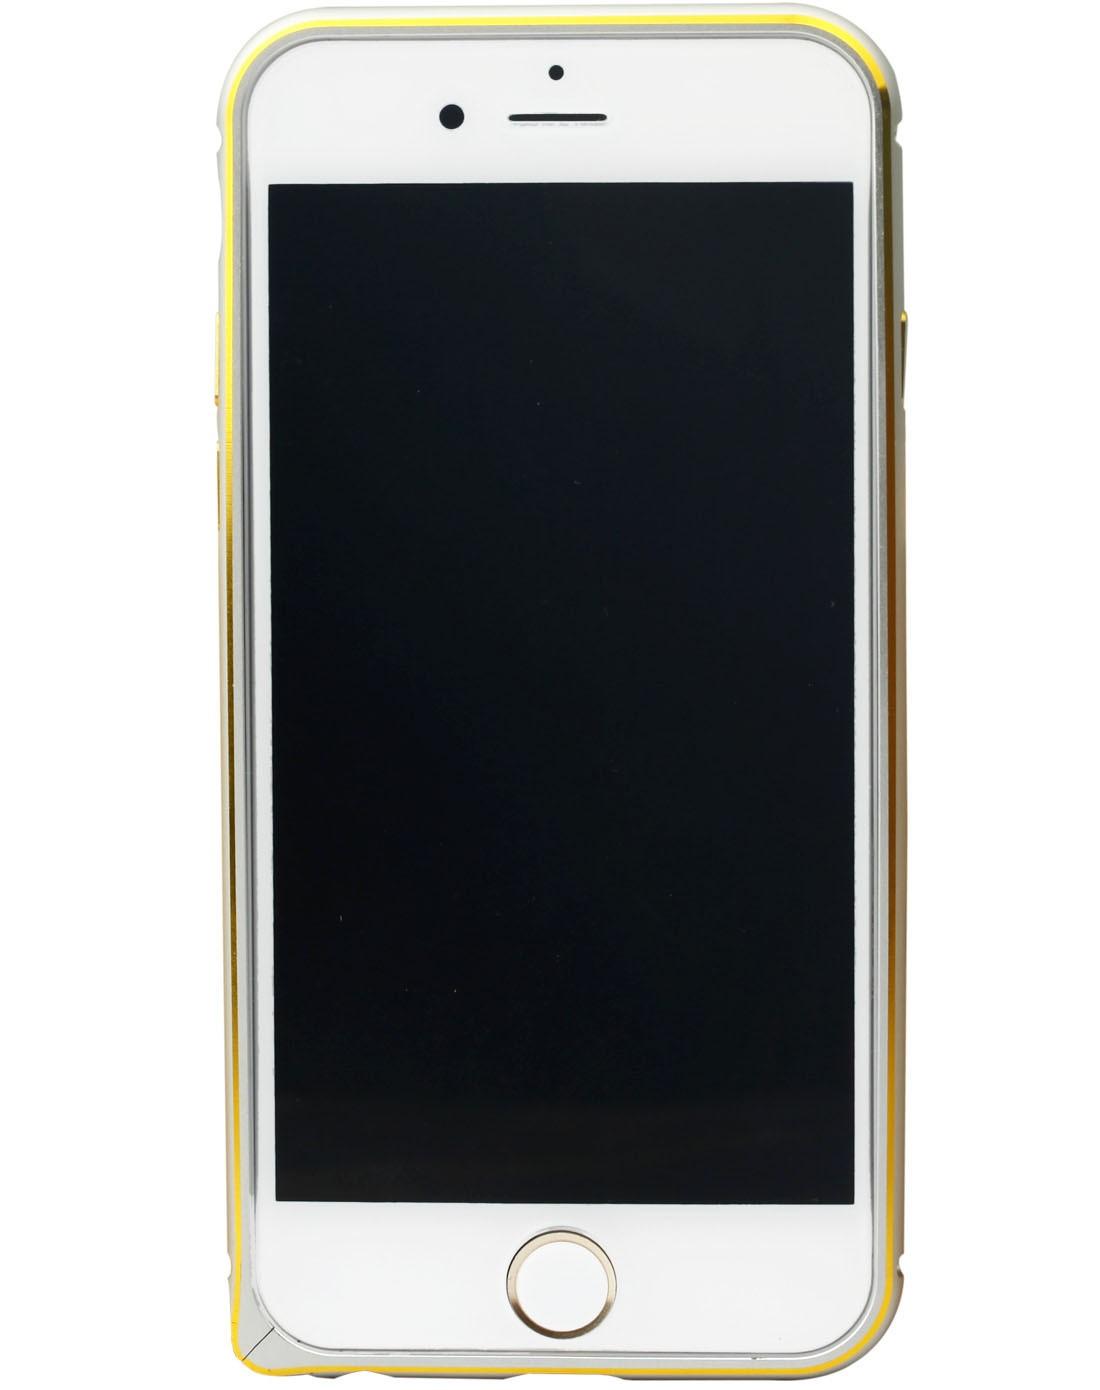 56eR5bm75bCP6K05bCB6Z2i_iphone6金属边框4.7寸 银色